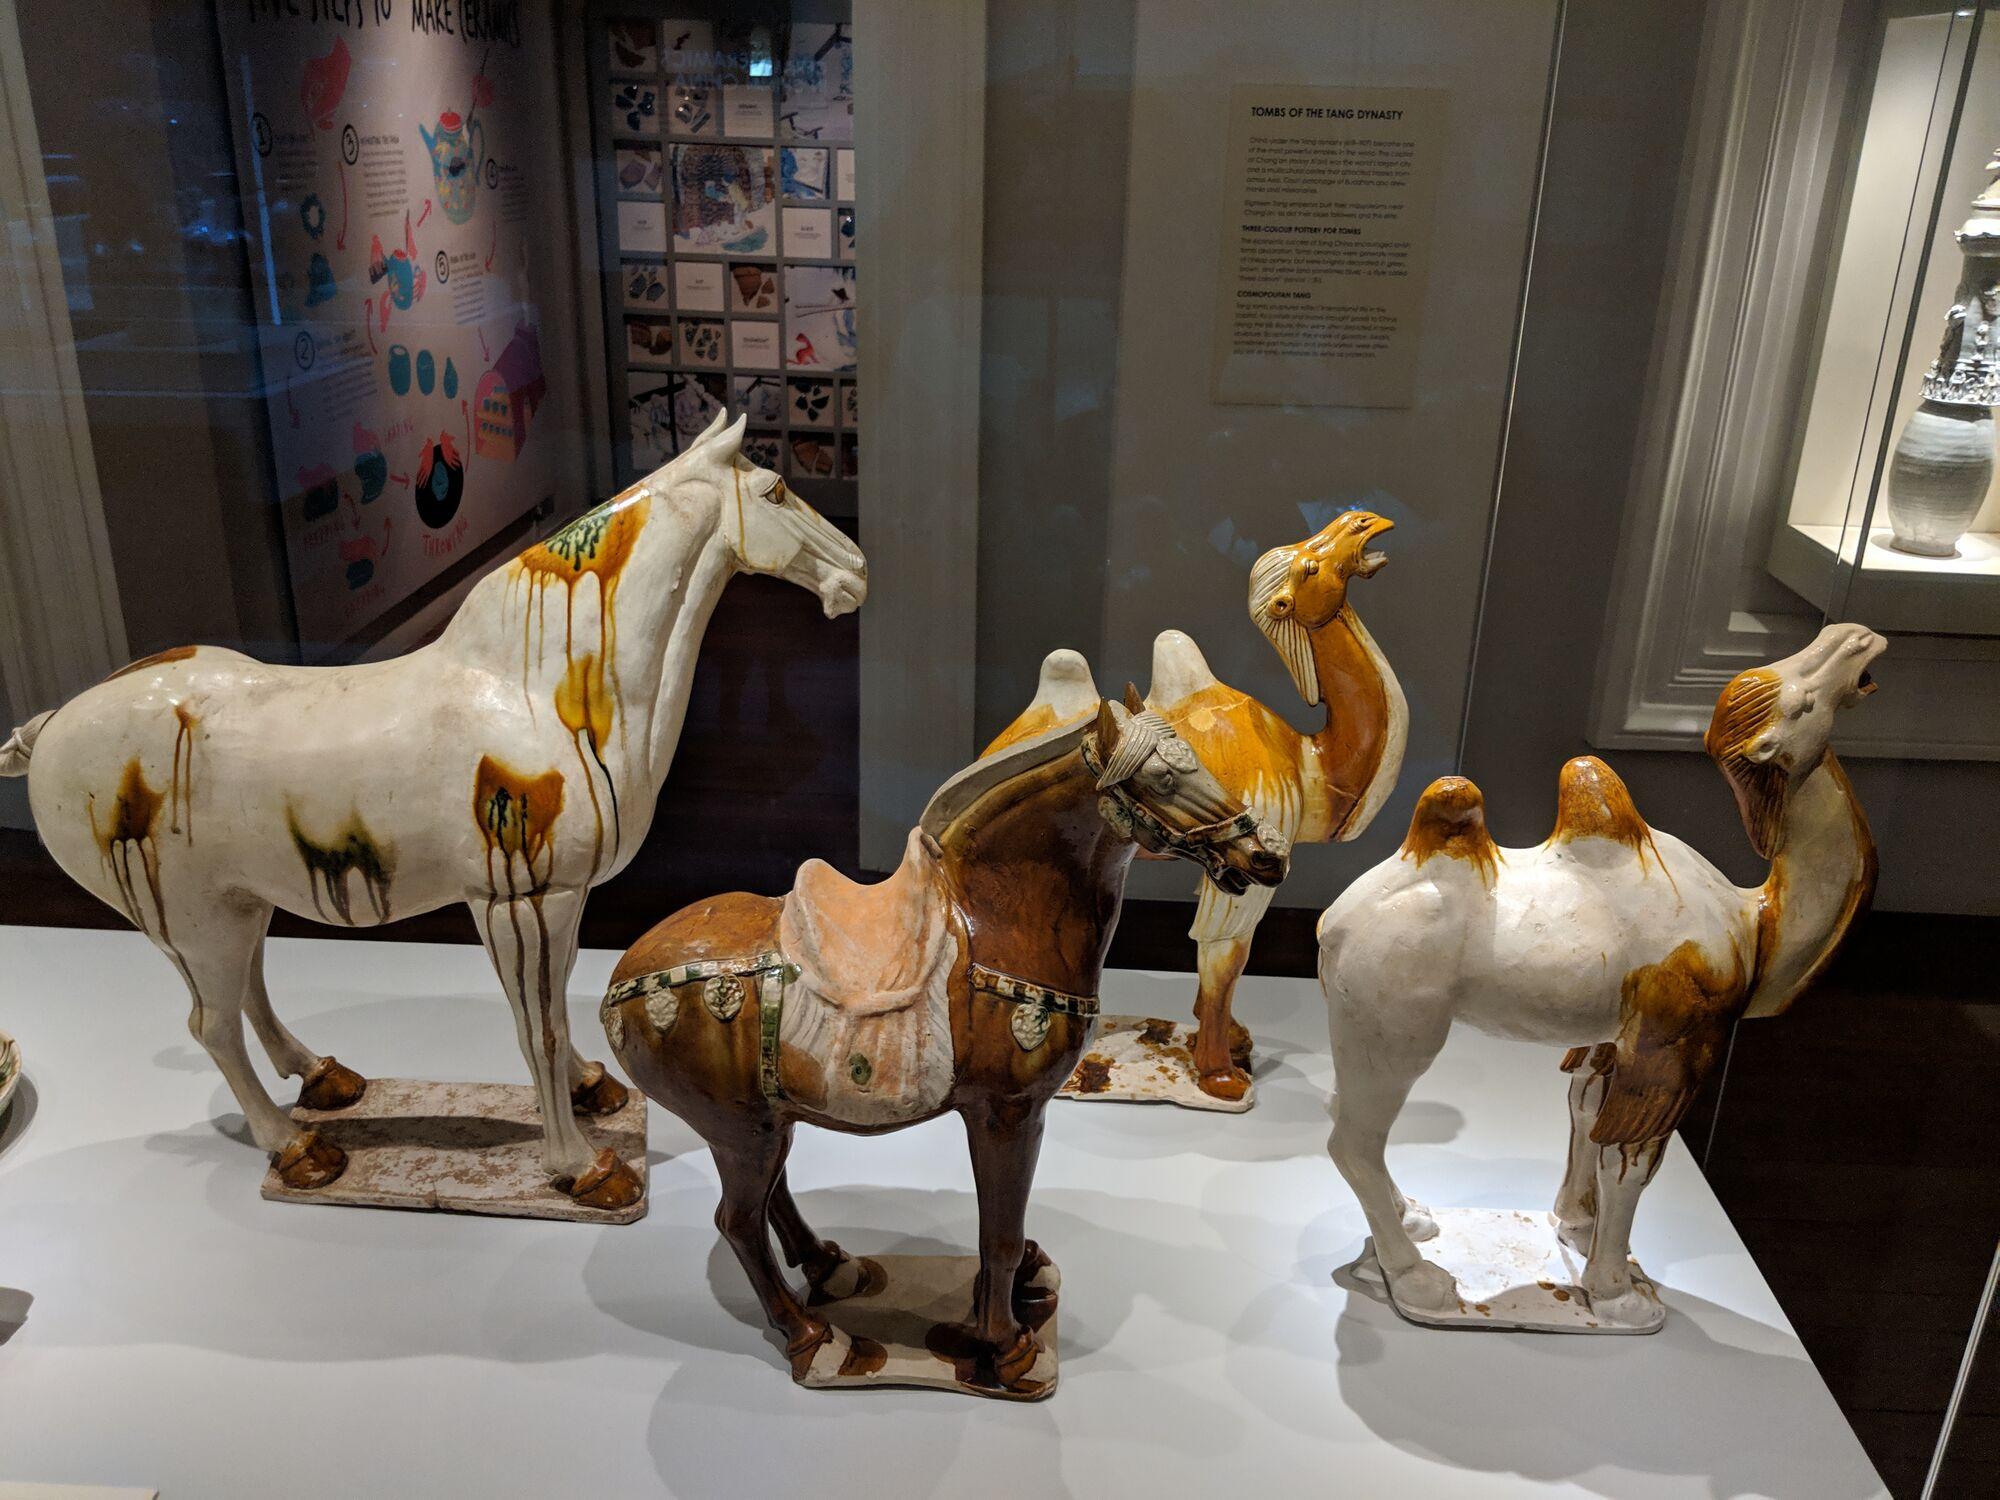 Horse, China, Shaanxi Province, Tang Dynasty (618-907), Earthernware.